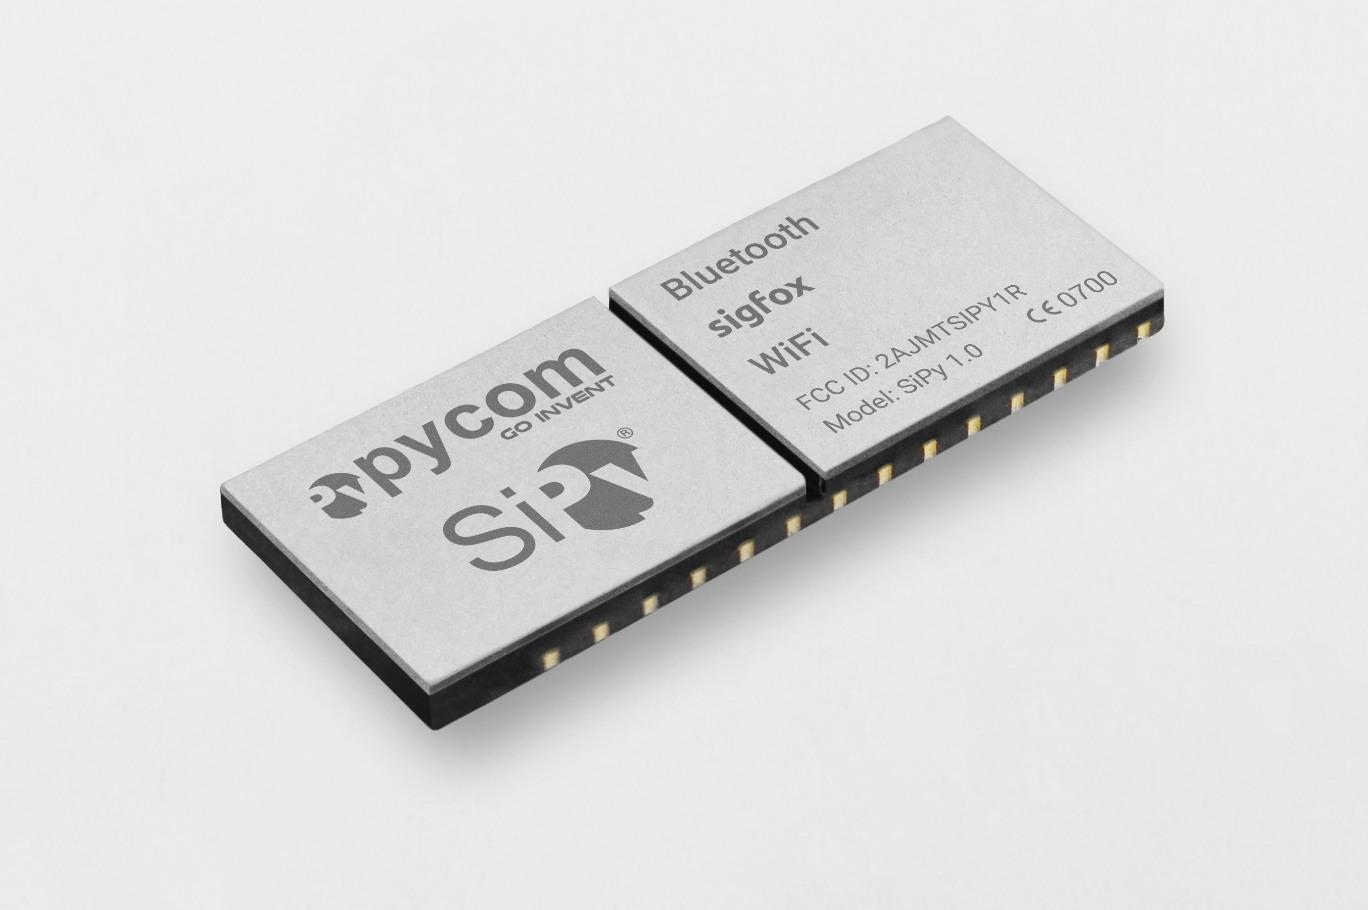 S01 (SiPy) OEM Module 22dBm | Sigfox Partner Network | The